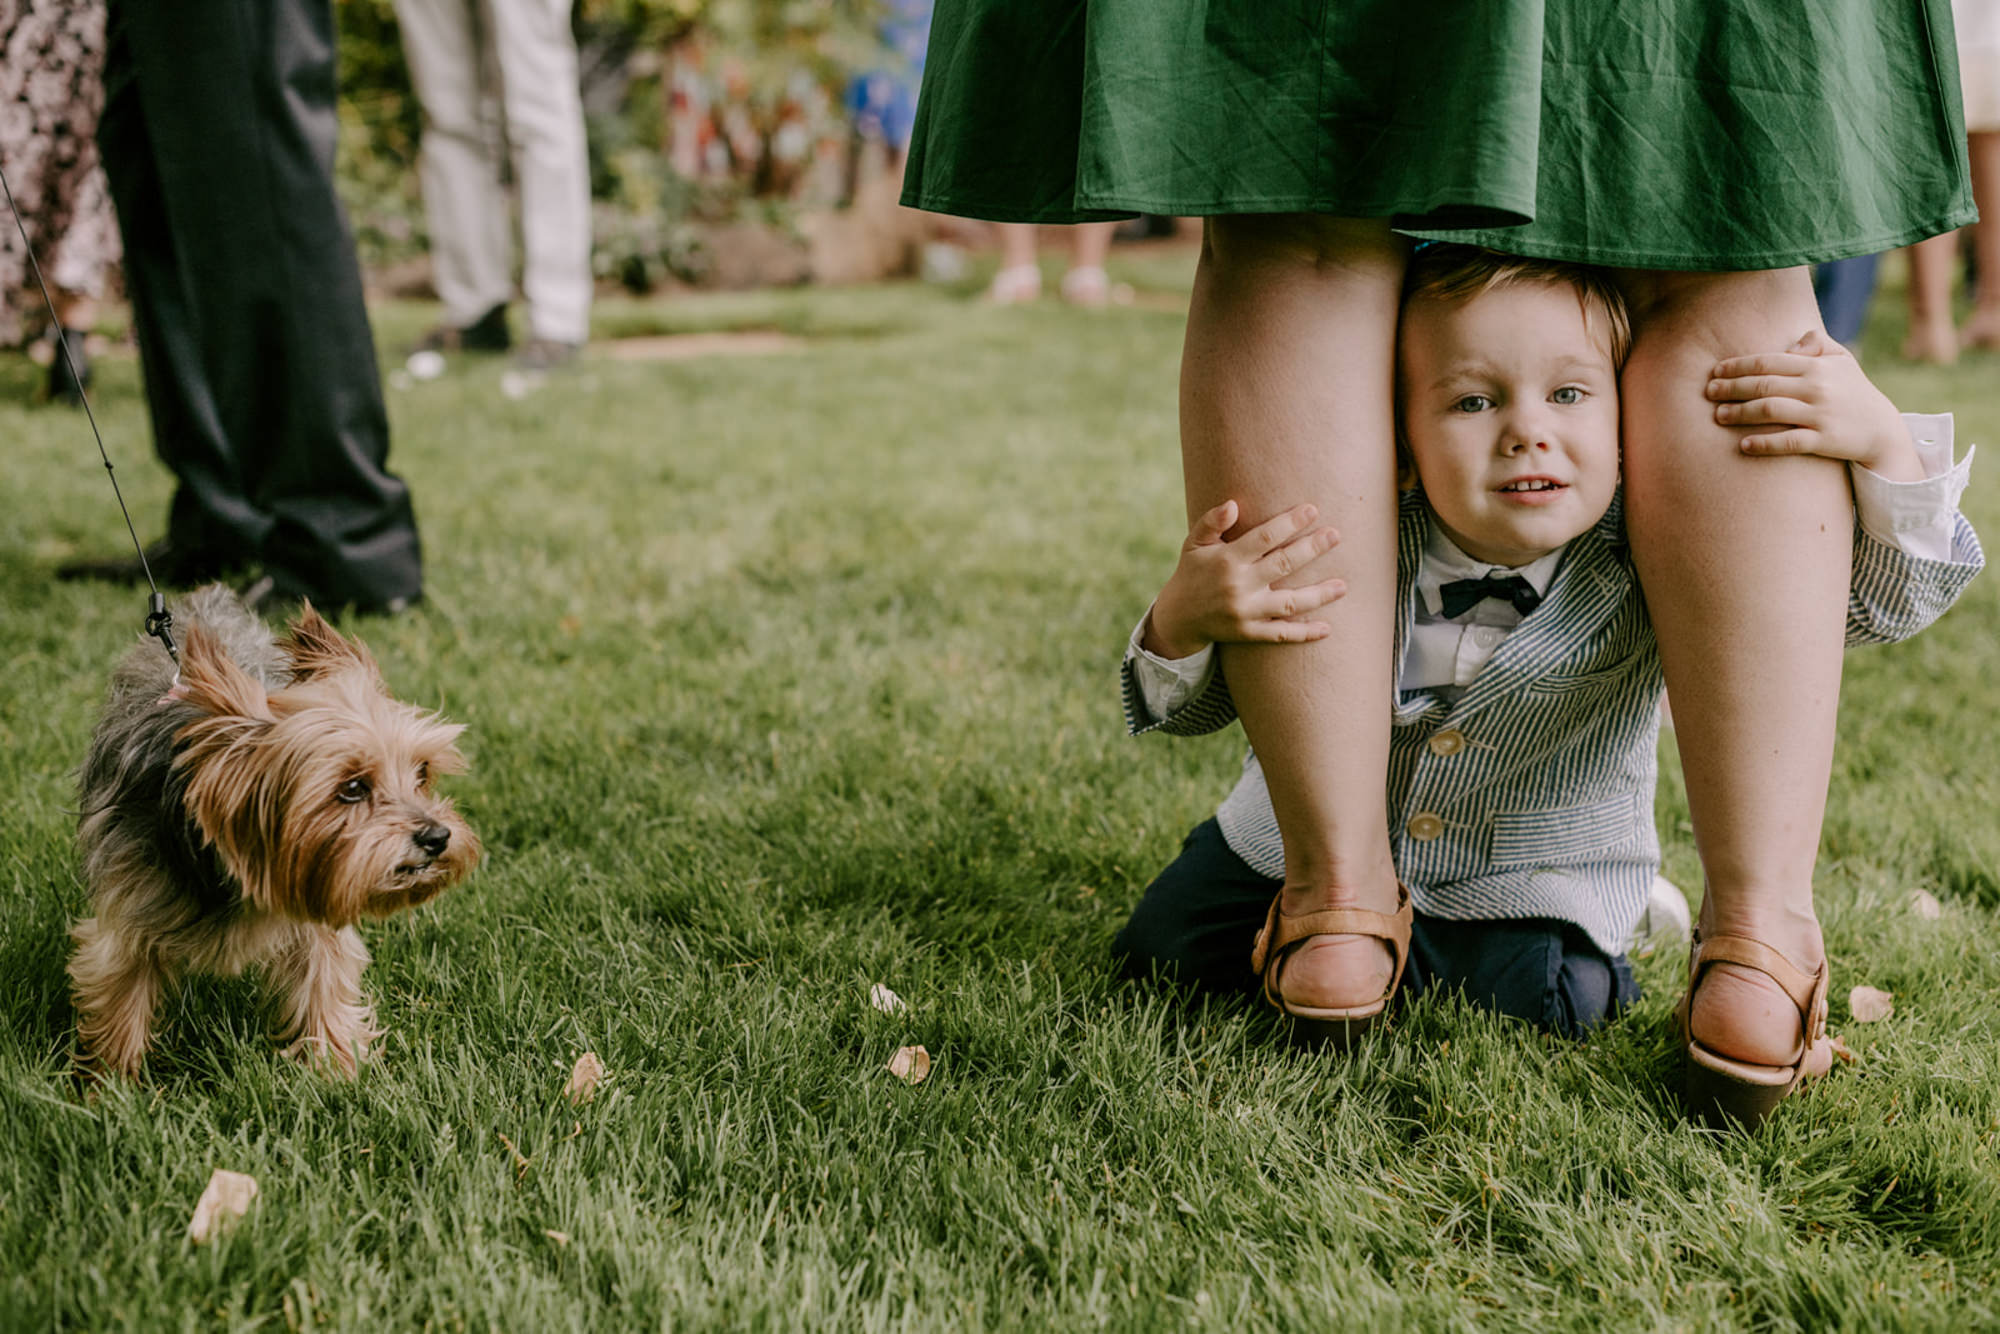 Little boy looks between bridesmaids legs with terrier  - photo by Kristen Marie Parker